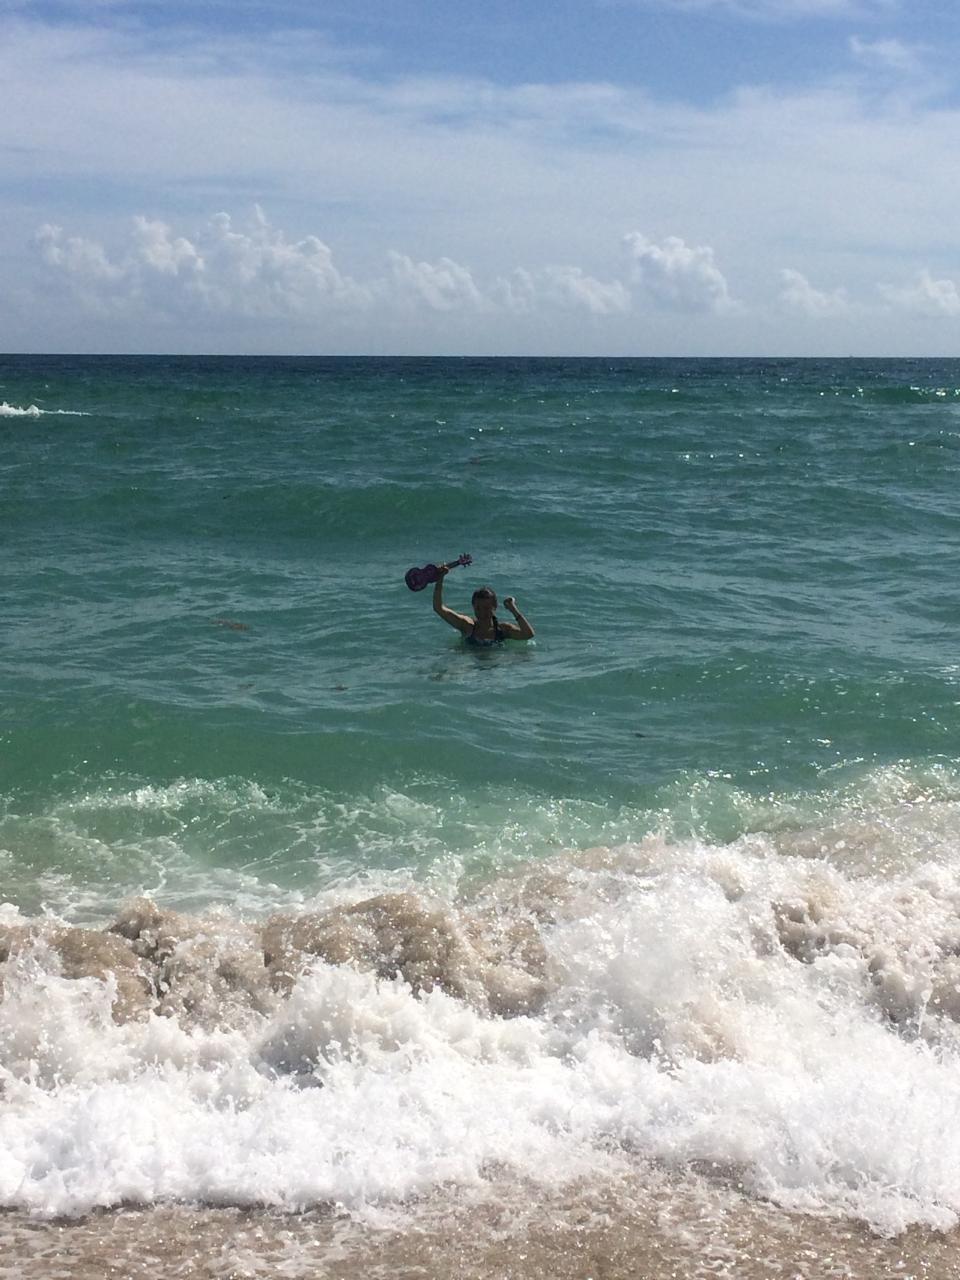 Makala Waterman meets Atlantic Ocean